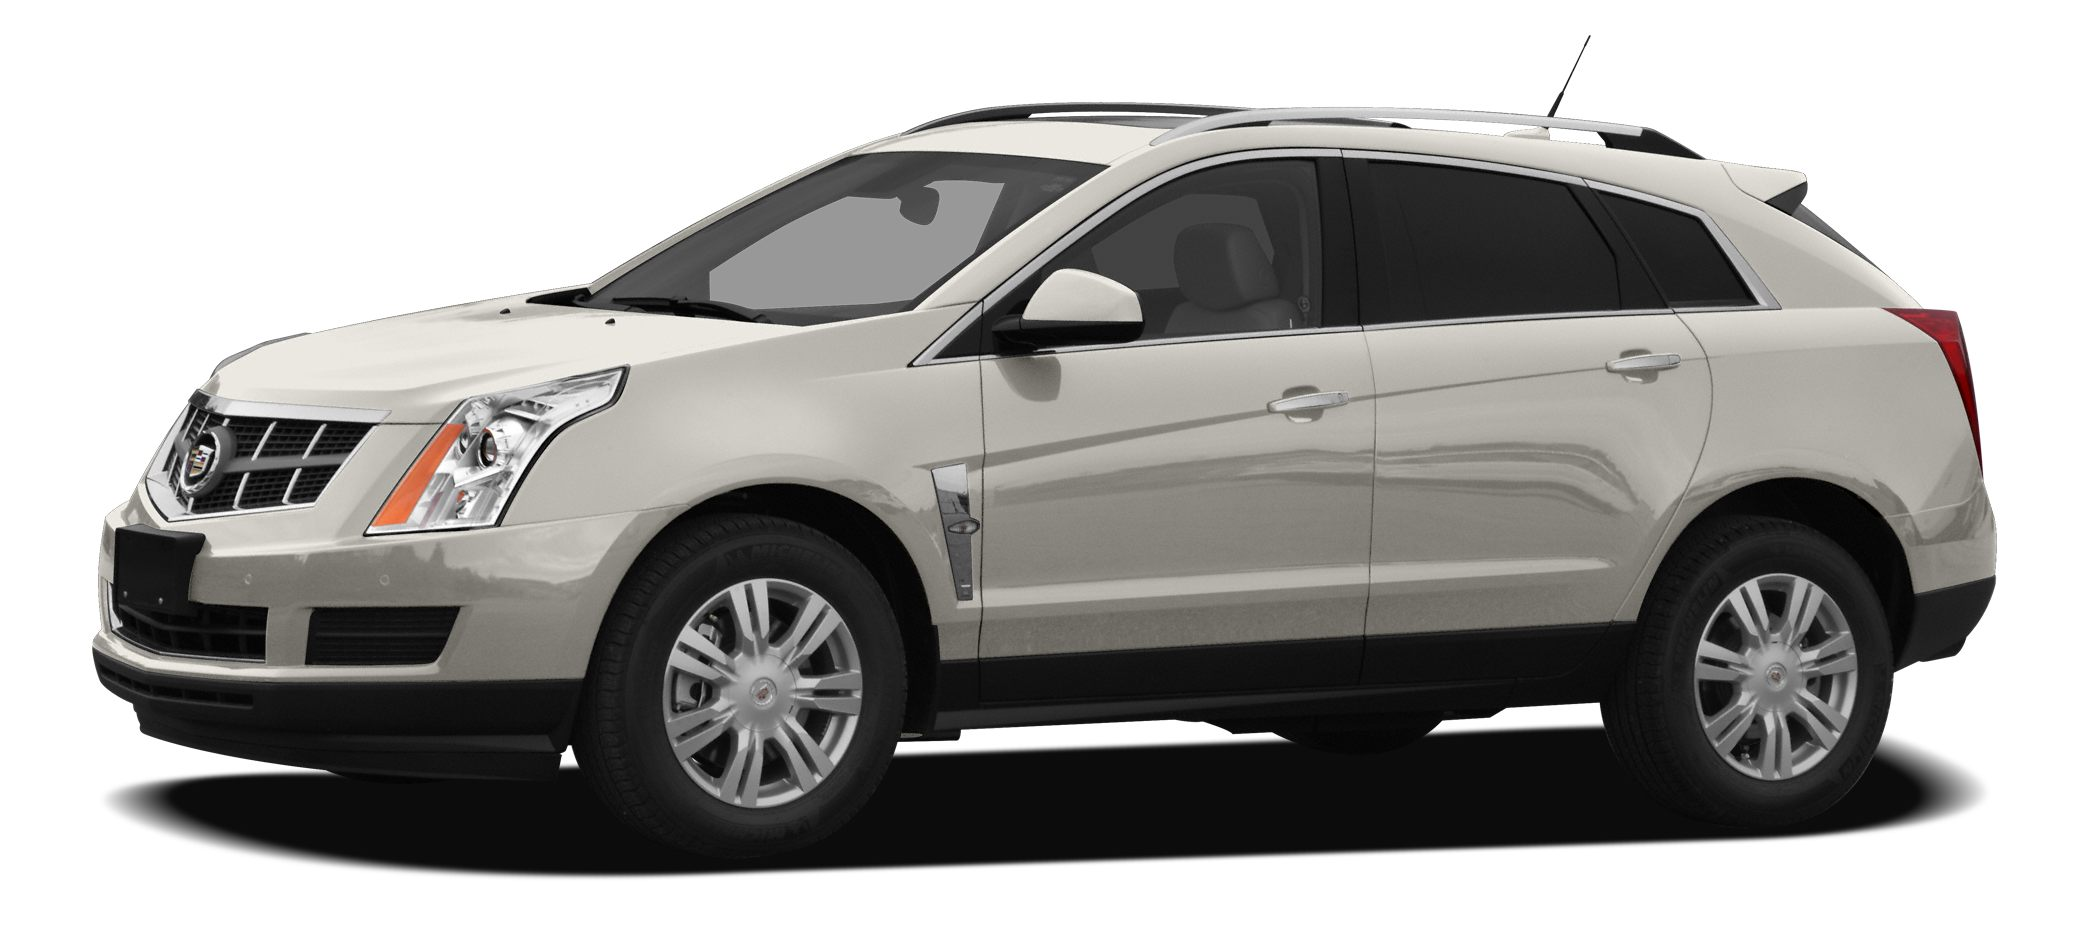 2010 Cadillac SRX Luxury Miles 67725Color Platinum Ice Tricoat Stock 641545 VIN 3GYFNAEY6AS6